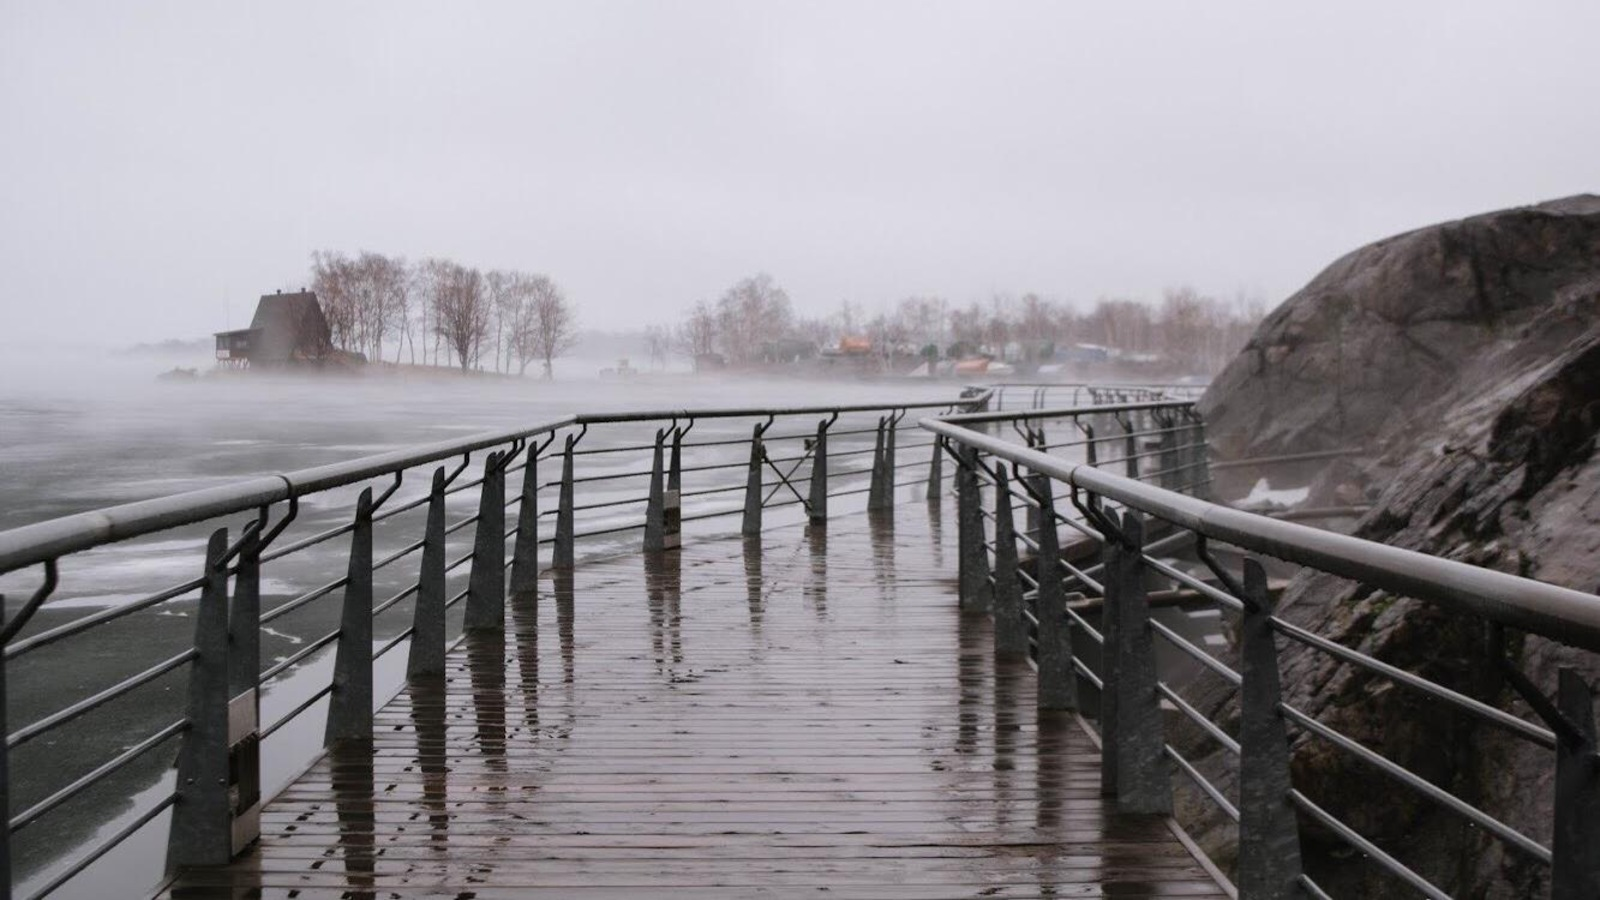 Photo d'une promenade en bois au bord du lac Ramsay à Sudbury, Ontario.